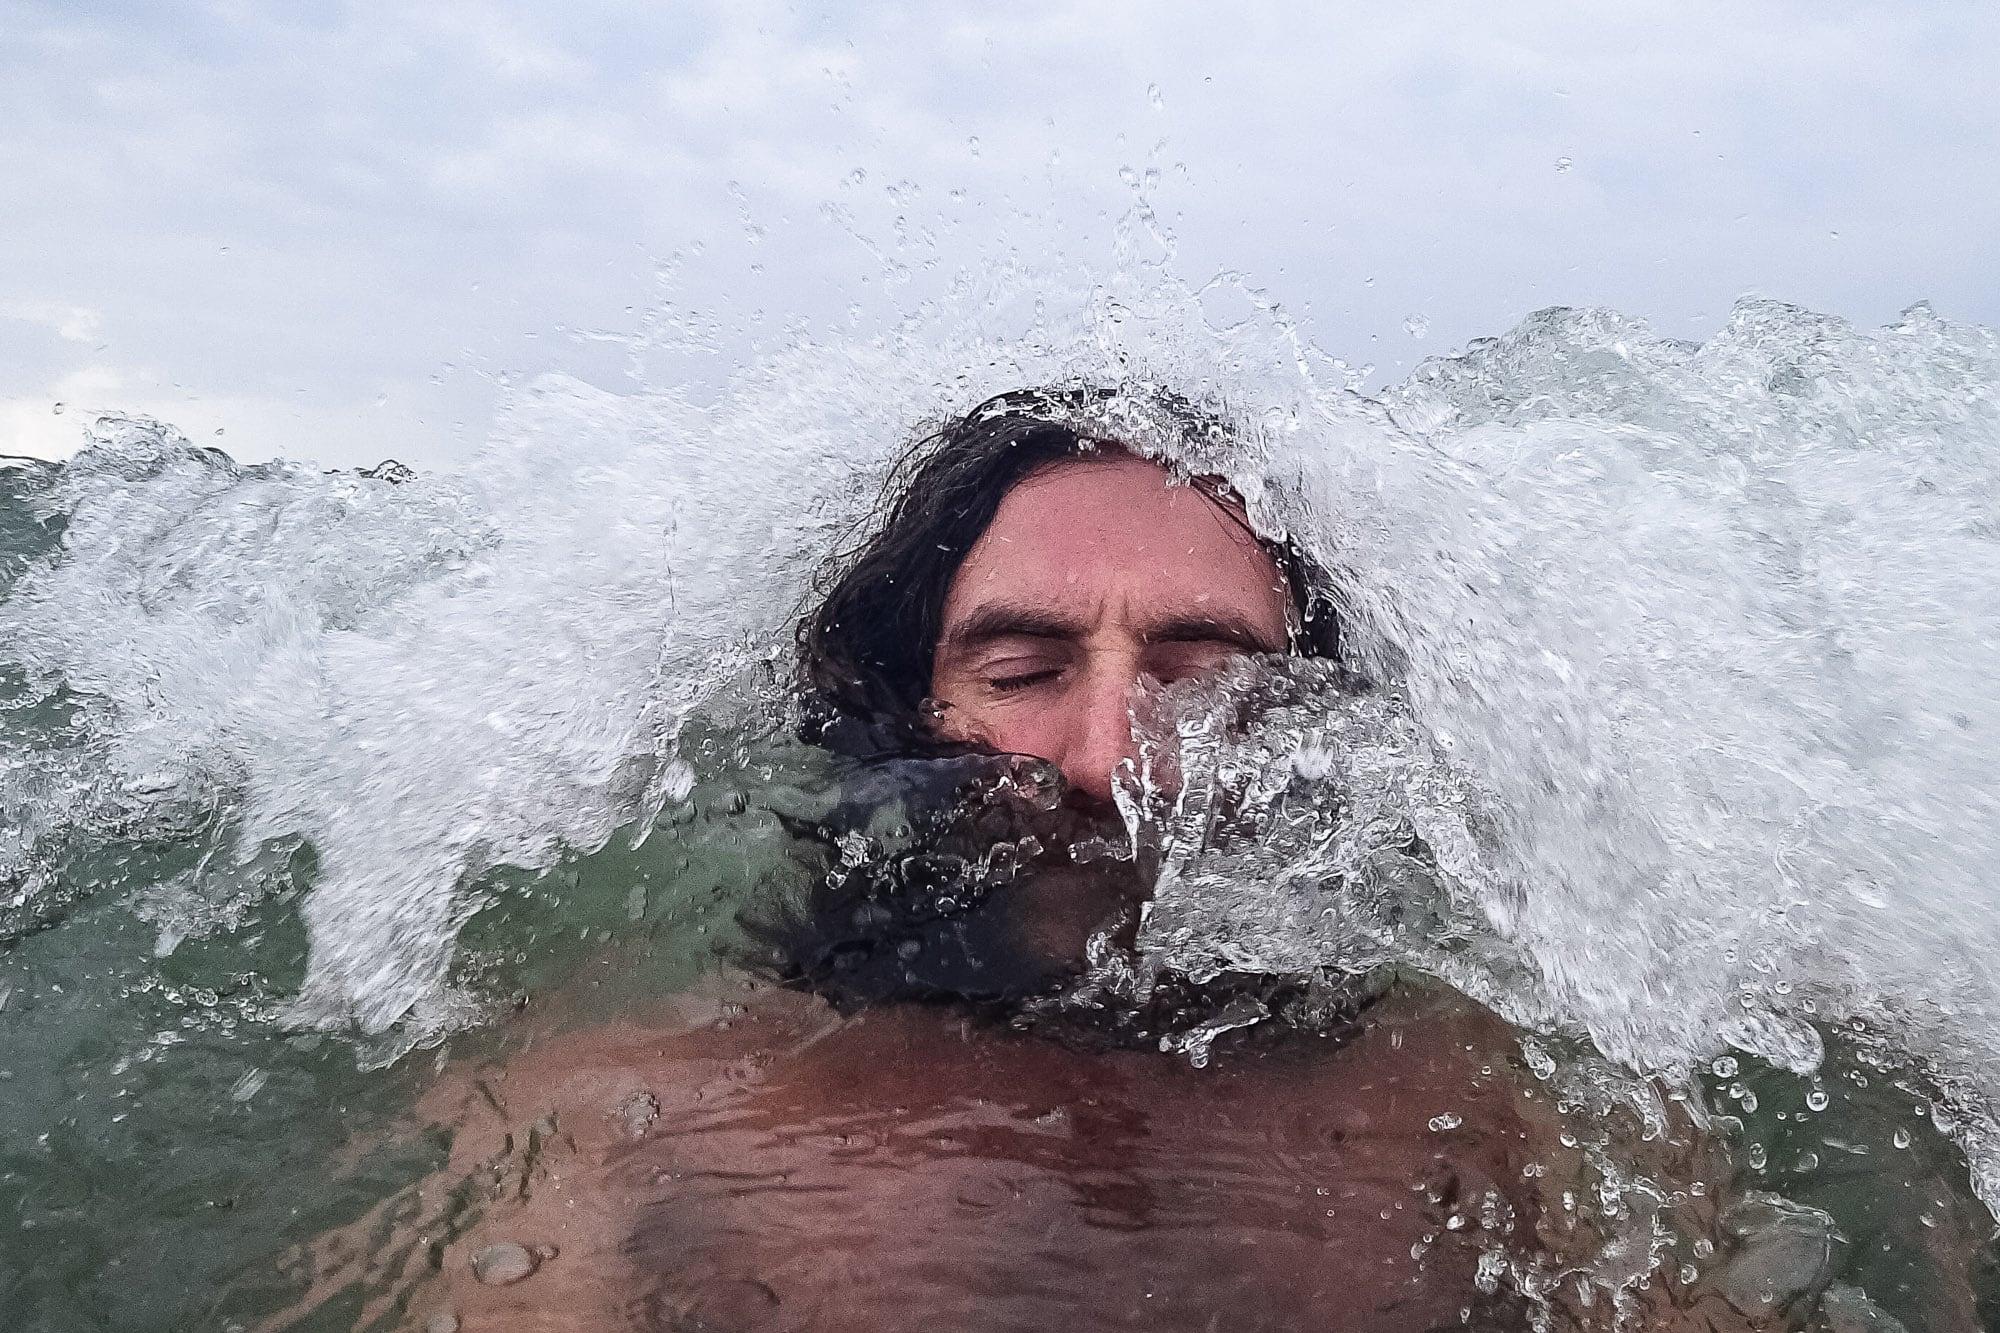 wave selfie 4